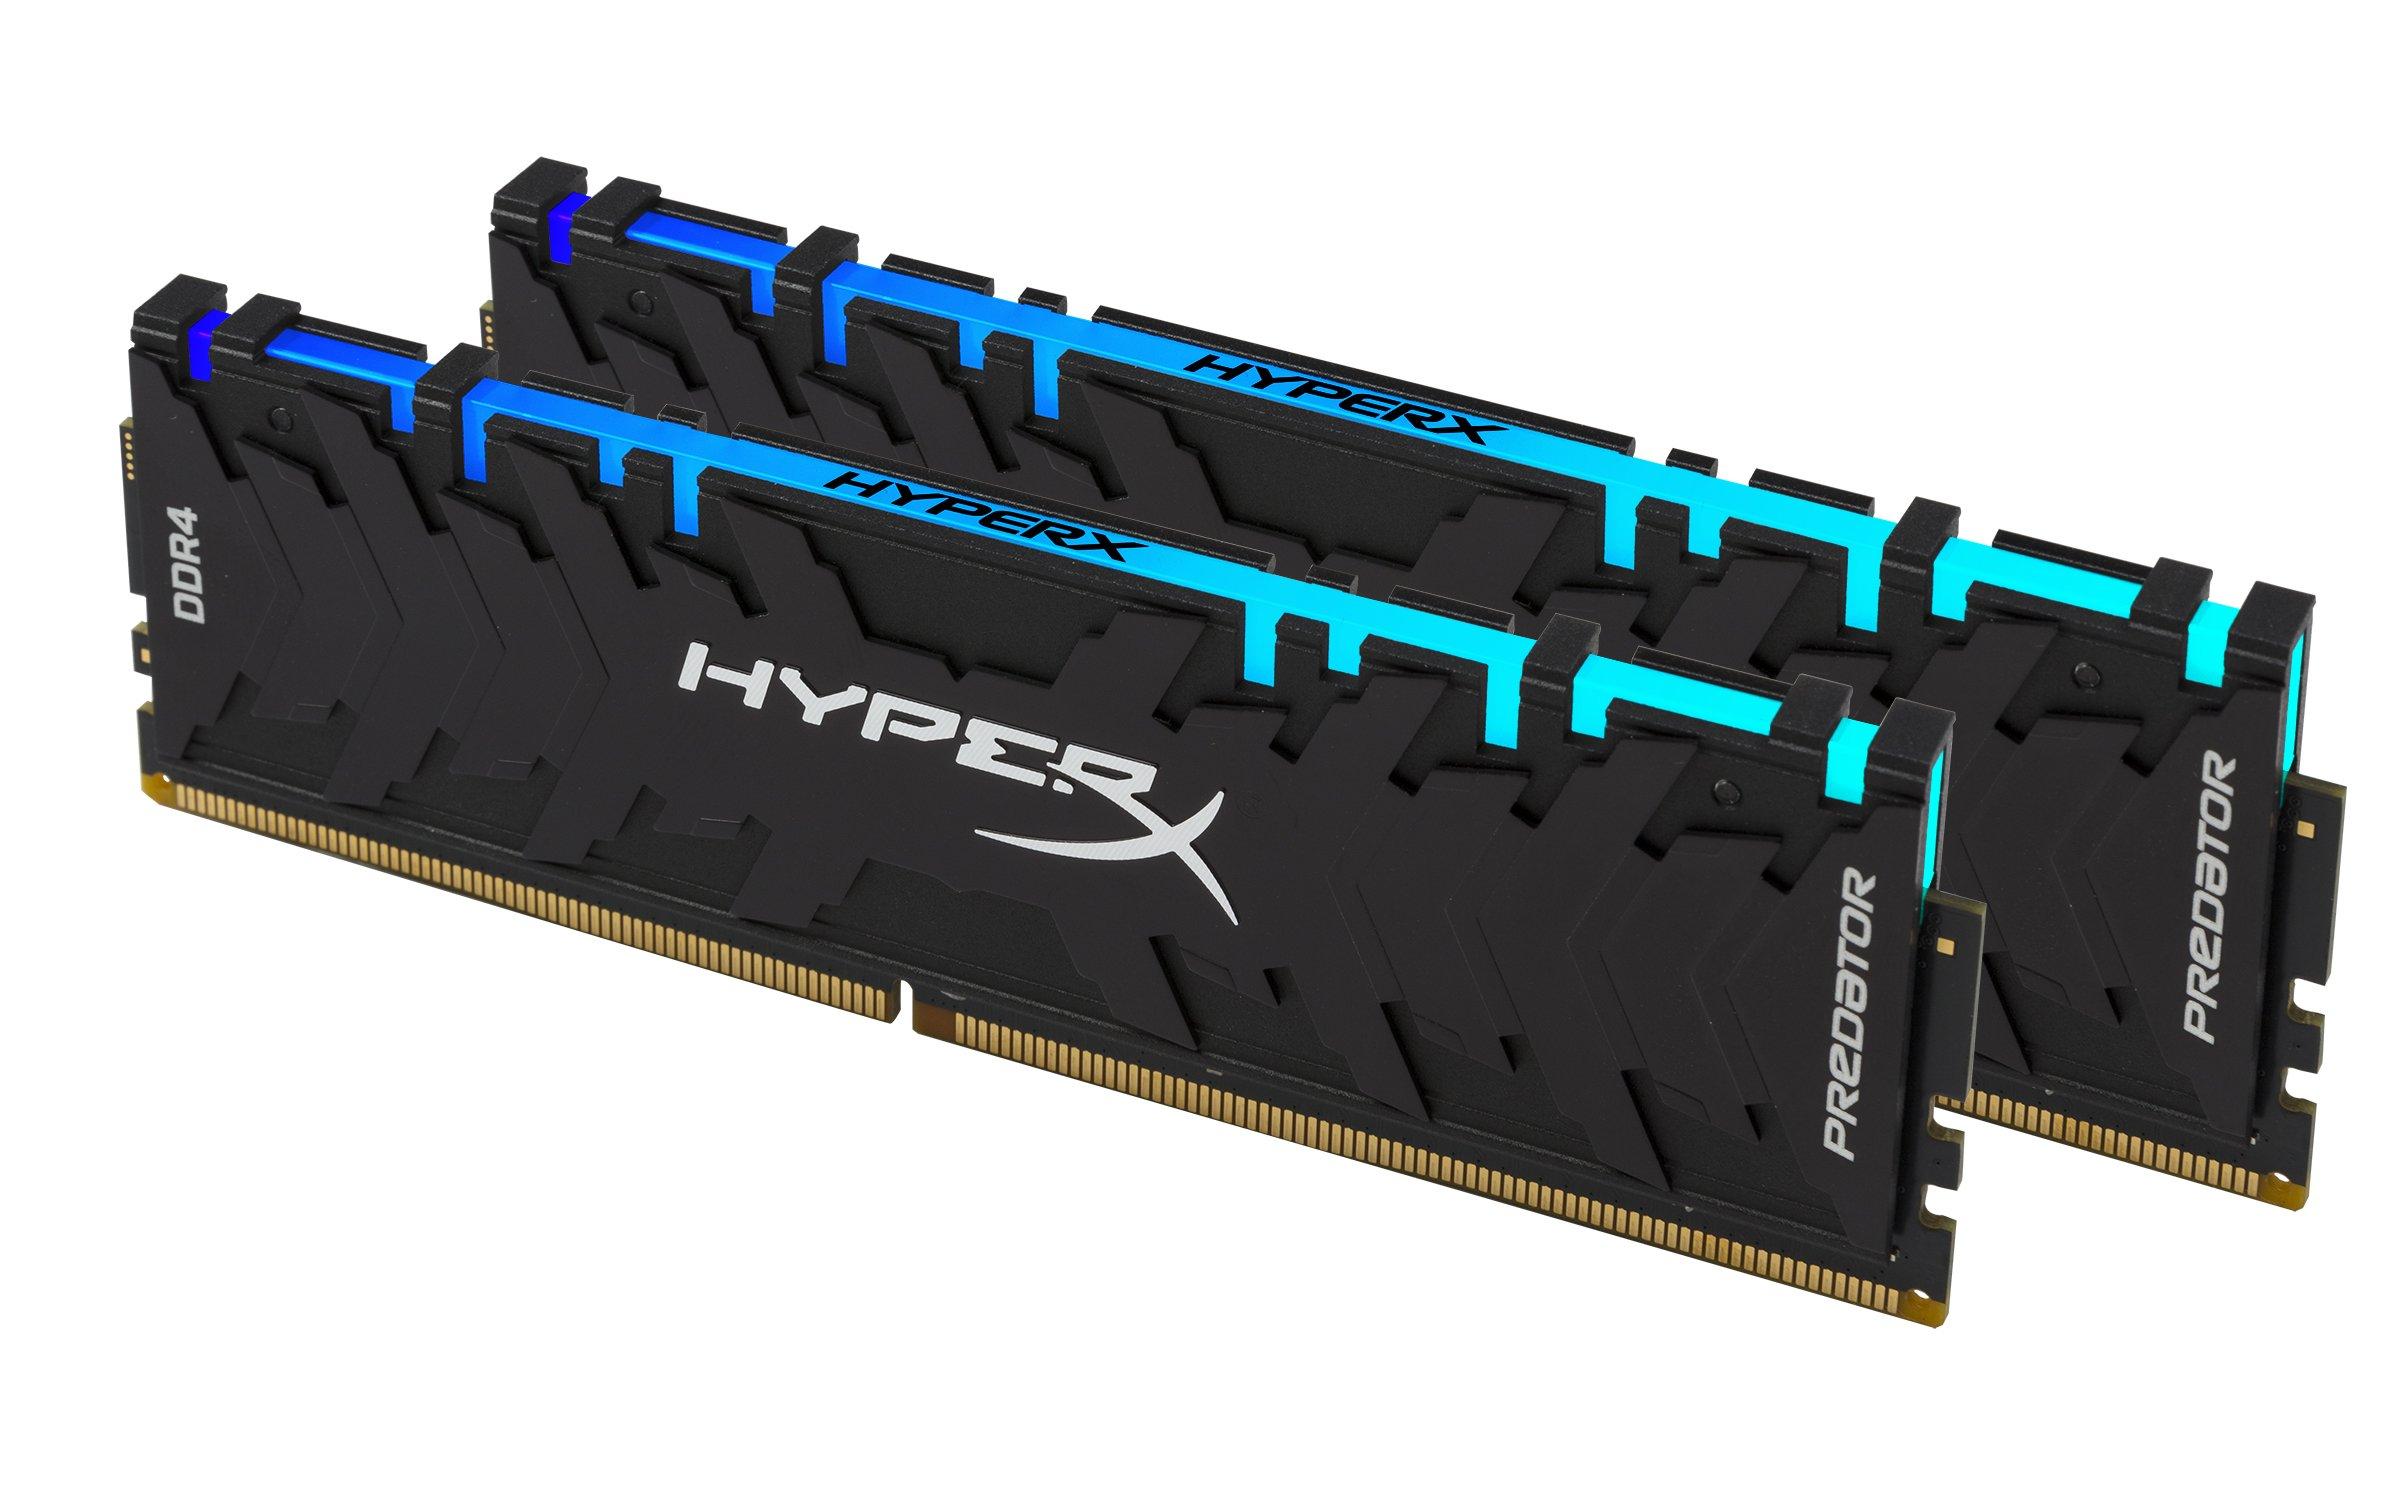 HyperX Predator DDR4 RGB 16GB kit 3200MHz CL16 DIMM XMP RAM Memory/Infrared Sync Technology Black (HX432C16PB3AK2/16)